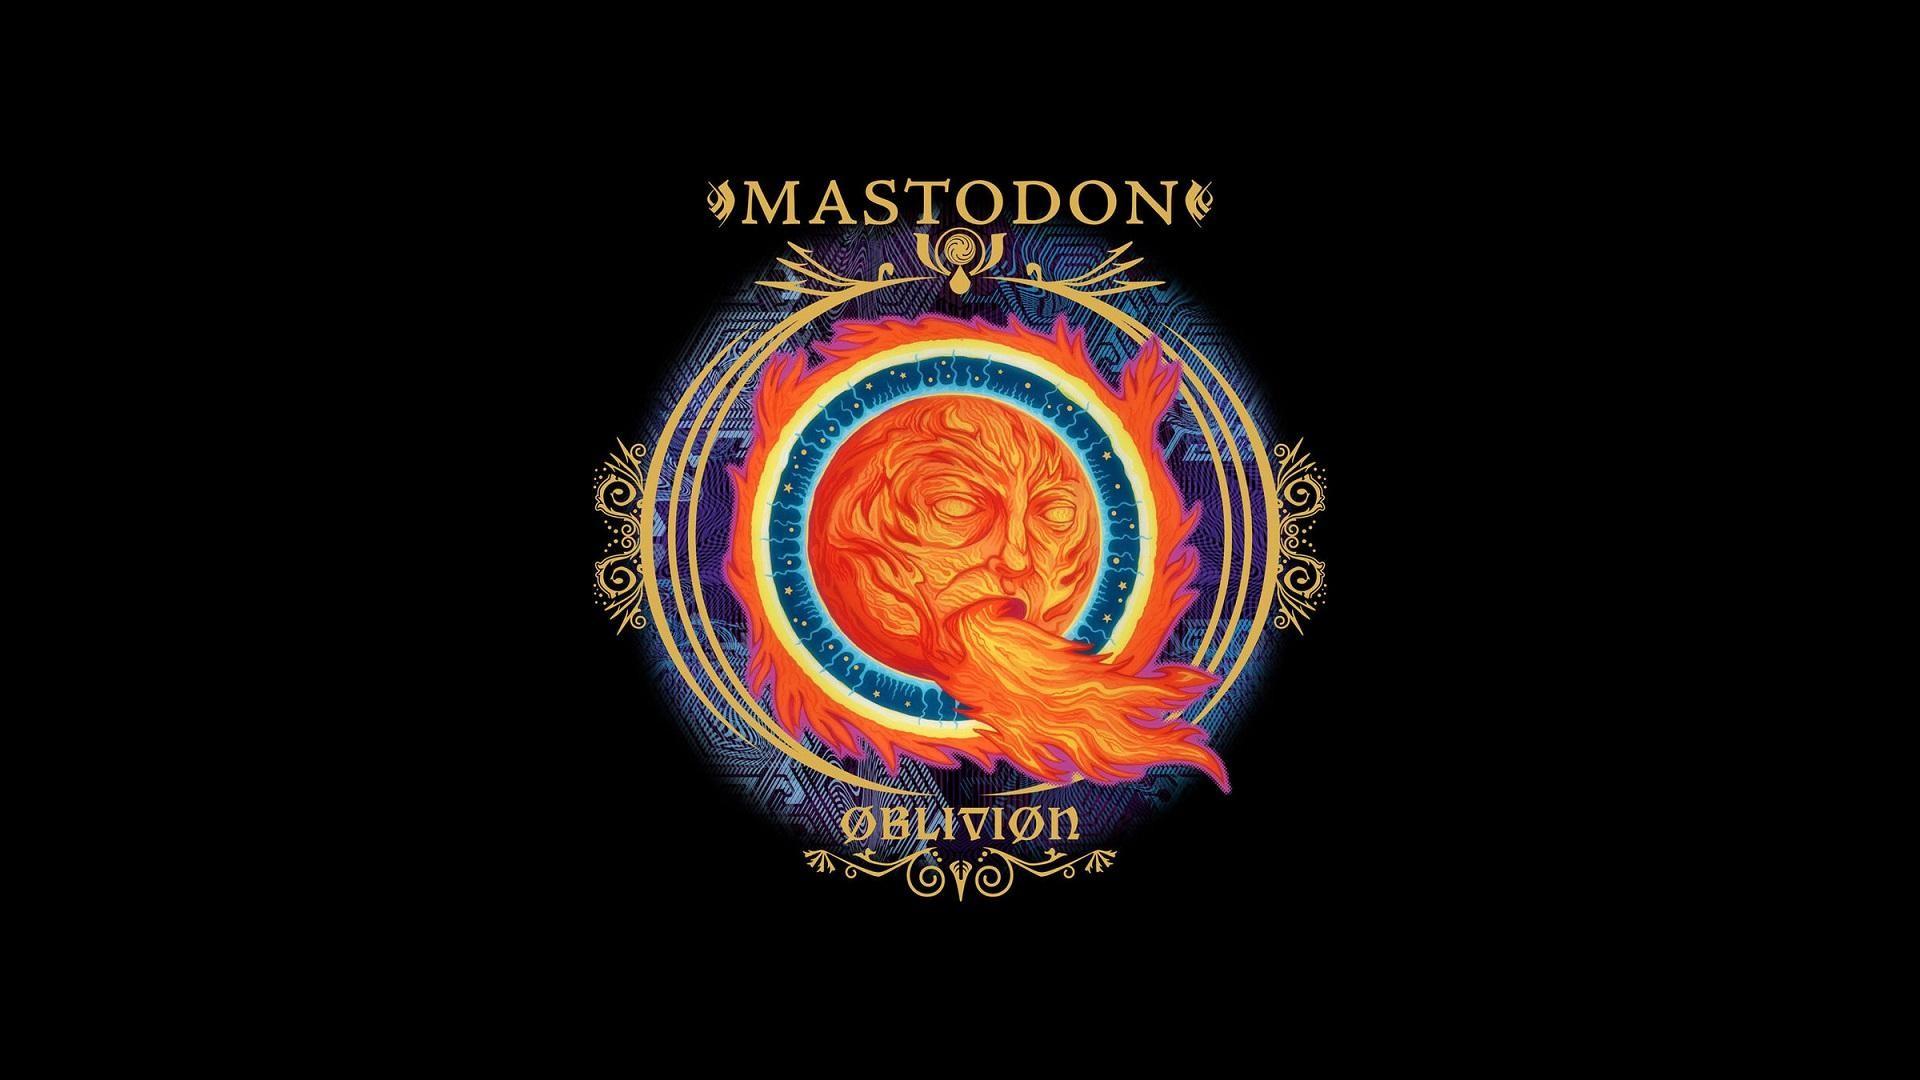 Mastodon Band Wallpaper